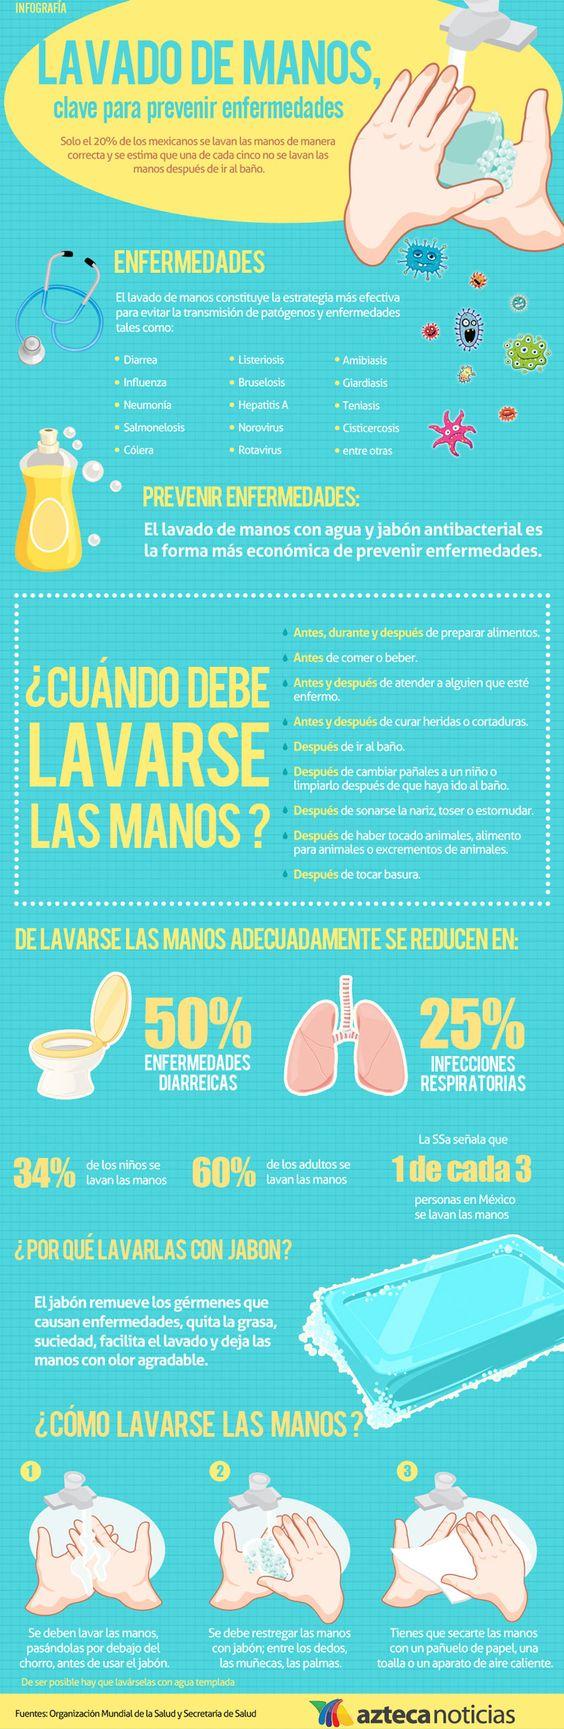 Lavado de manos, clave para prevenir enfermedades